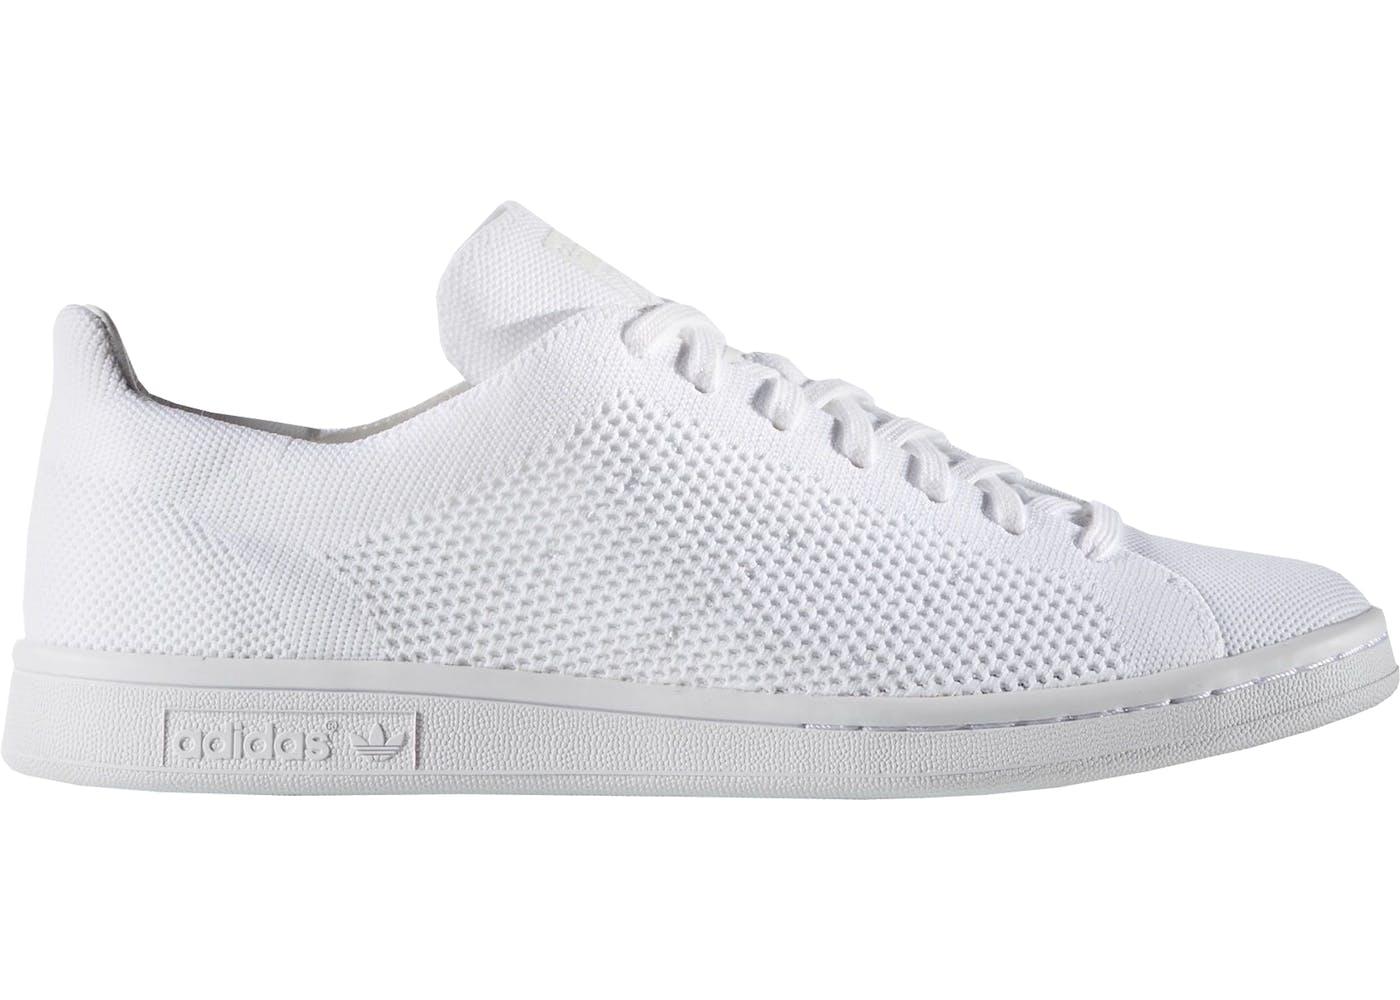 adidas stan smith primeknit triple white. Black Bedroom Furniture Sets. Home Design Ideas